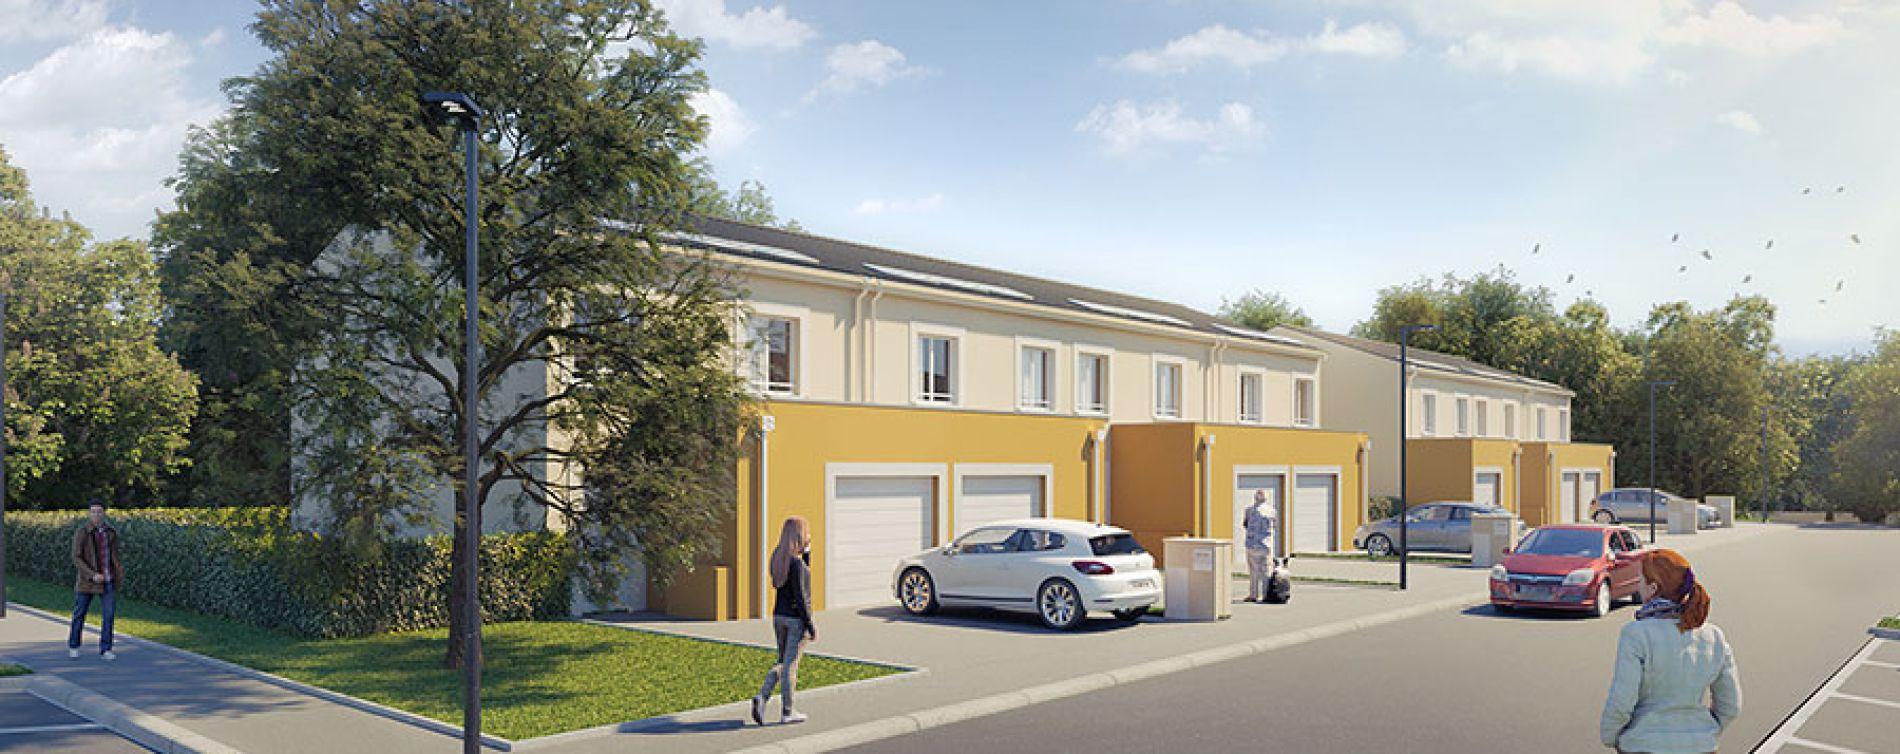 Mormant : programme immobilier neuve « Natura Park Phase 2 » (2)